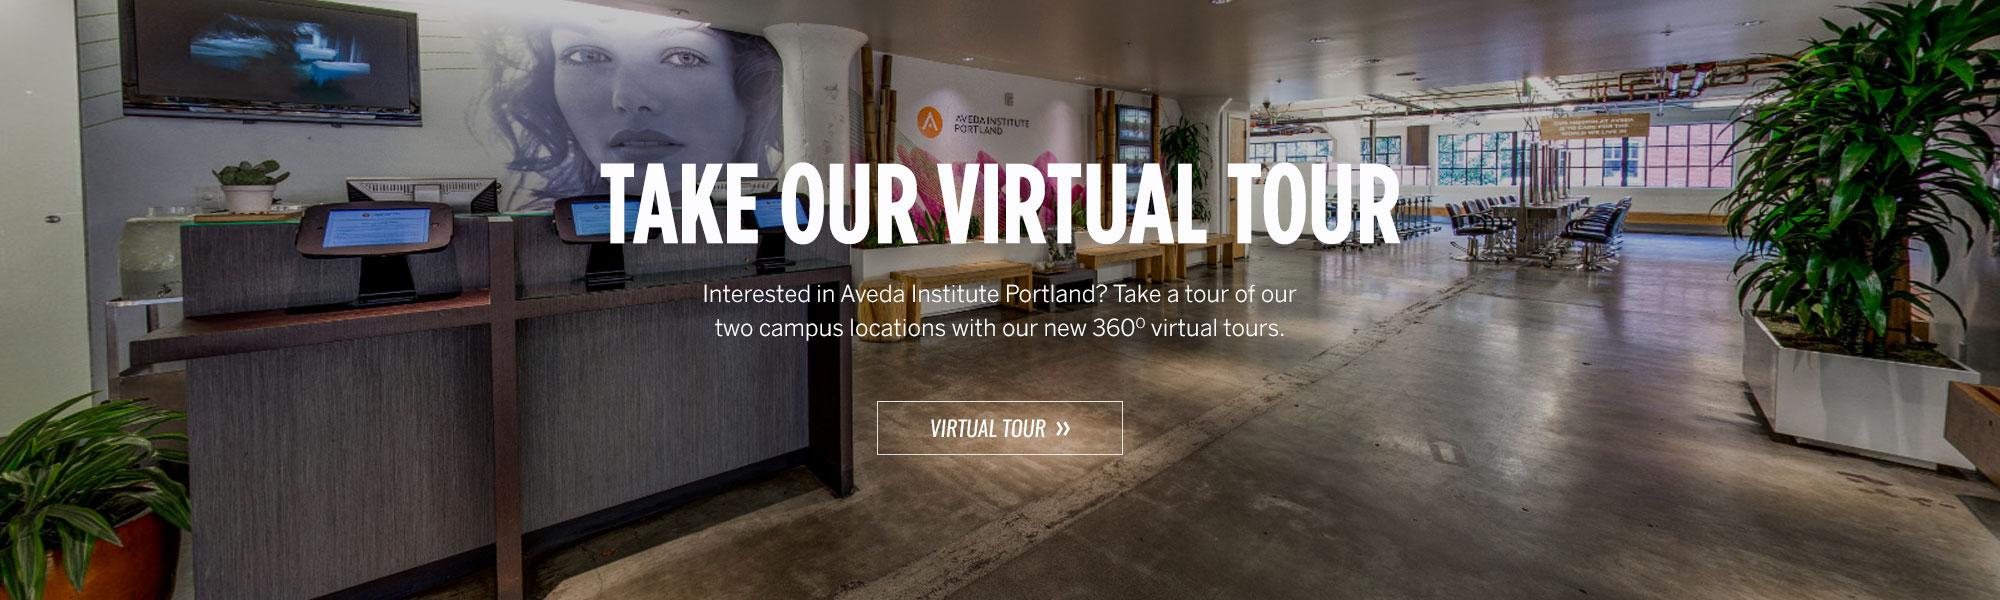 Virtual Tour - Aveda Institute Portland